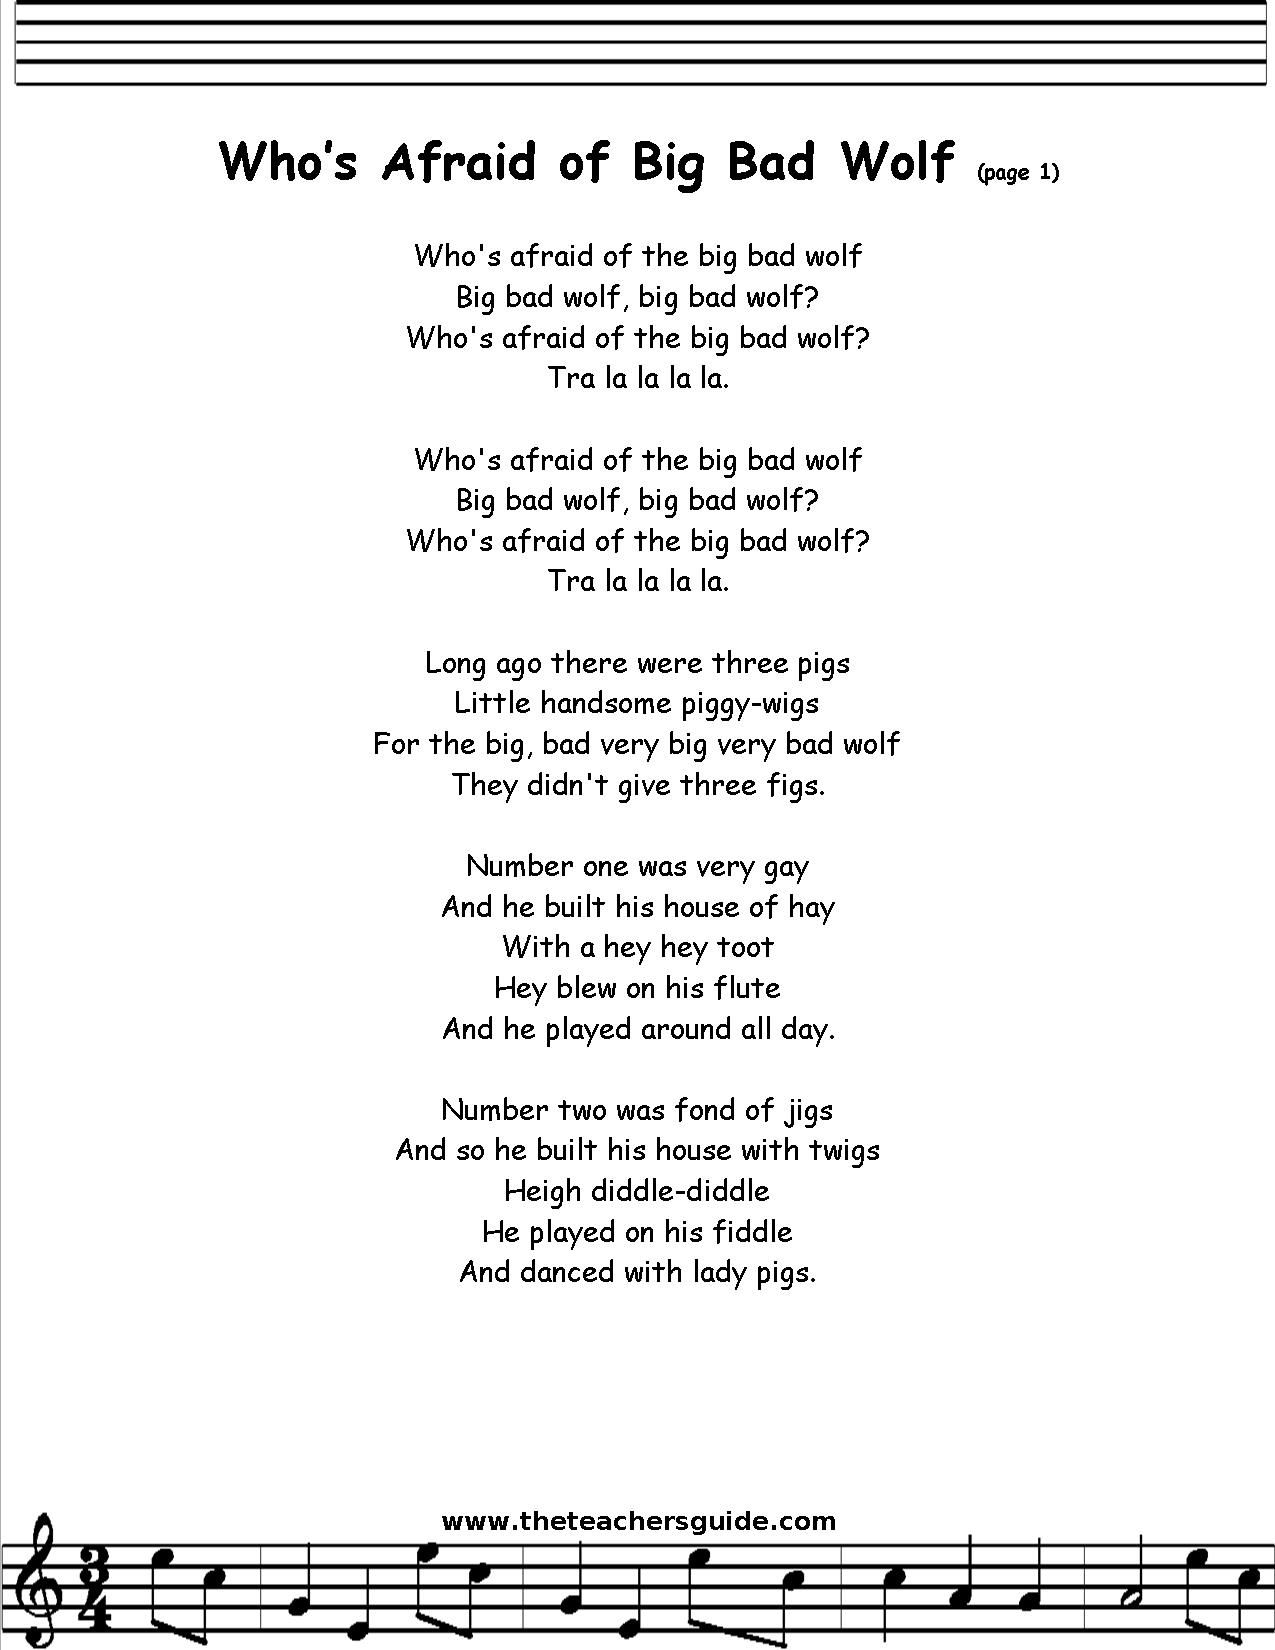 Big Mama Song Lyrics : lyrics, Who's, Afraid, Lyrics,, Printout,, MIDI,, Video, Song,